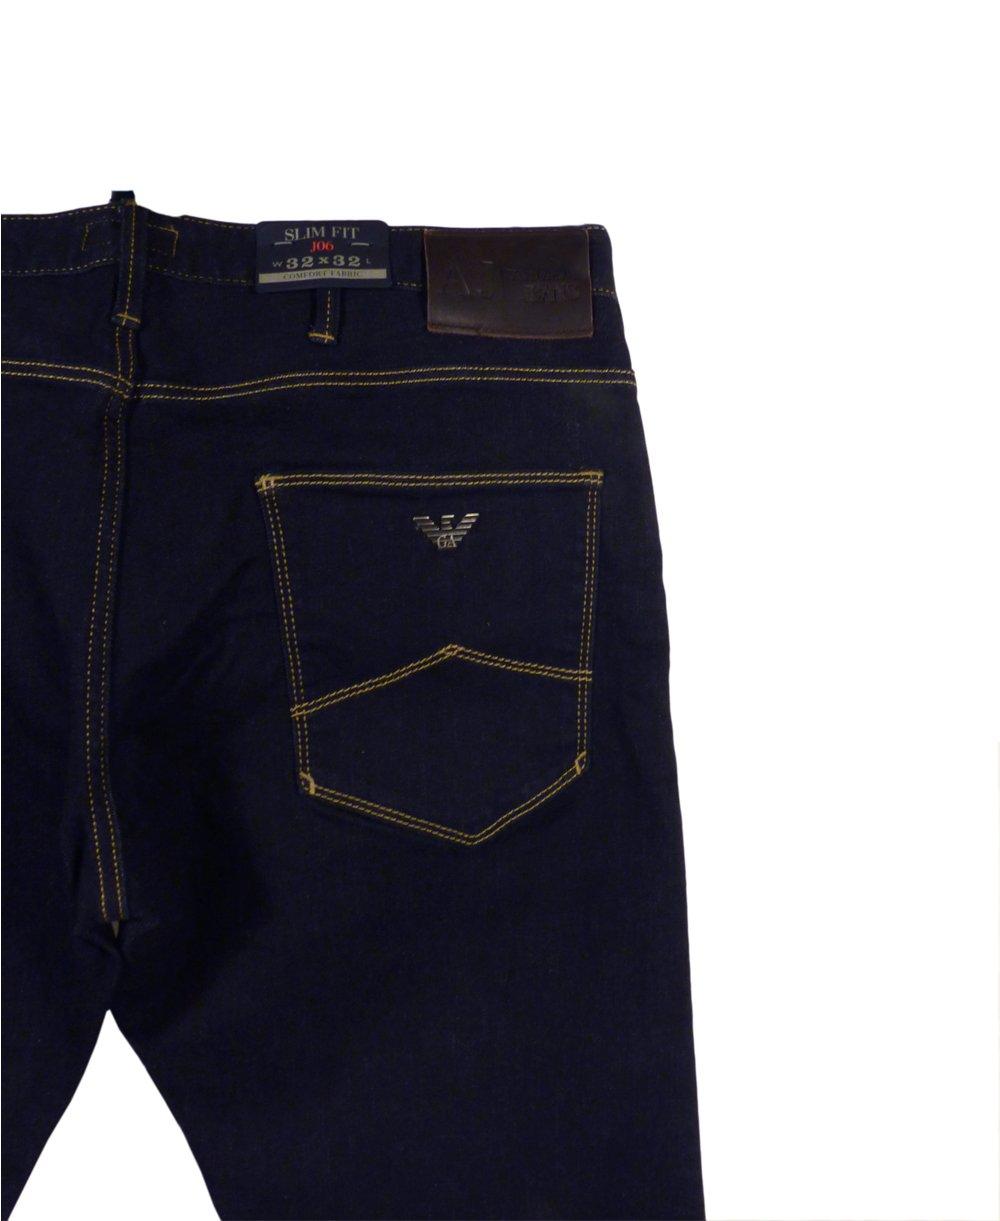 armani jeans jo6 slim fit jeans in dark blue armani. Black Bedroom Furniture Sets. Home Design Ideas